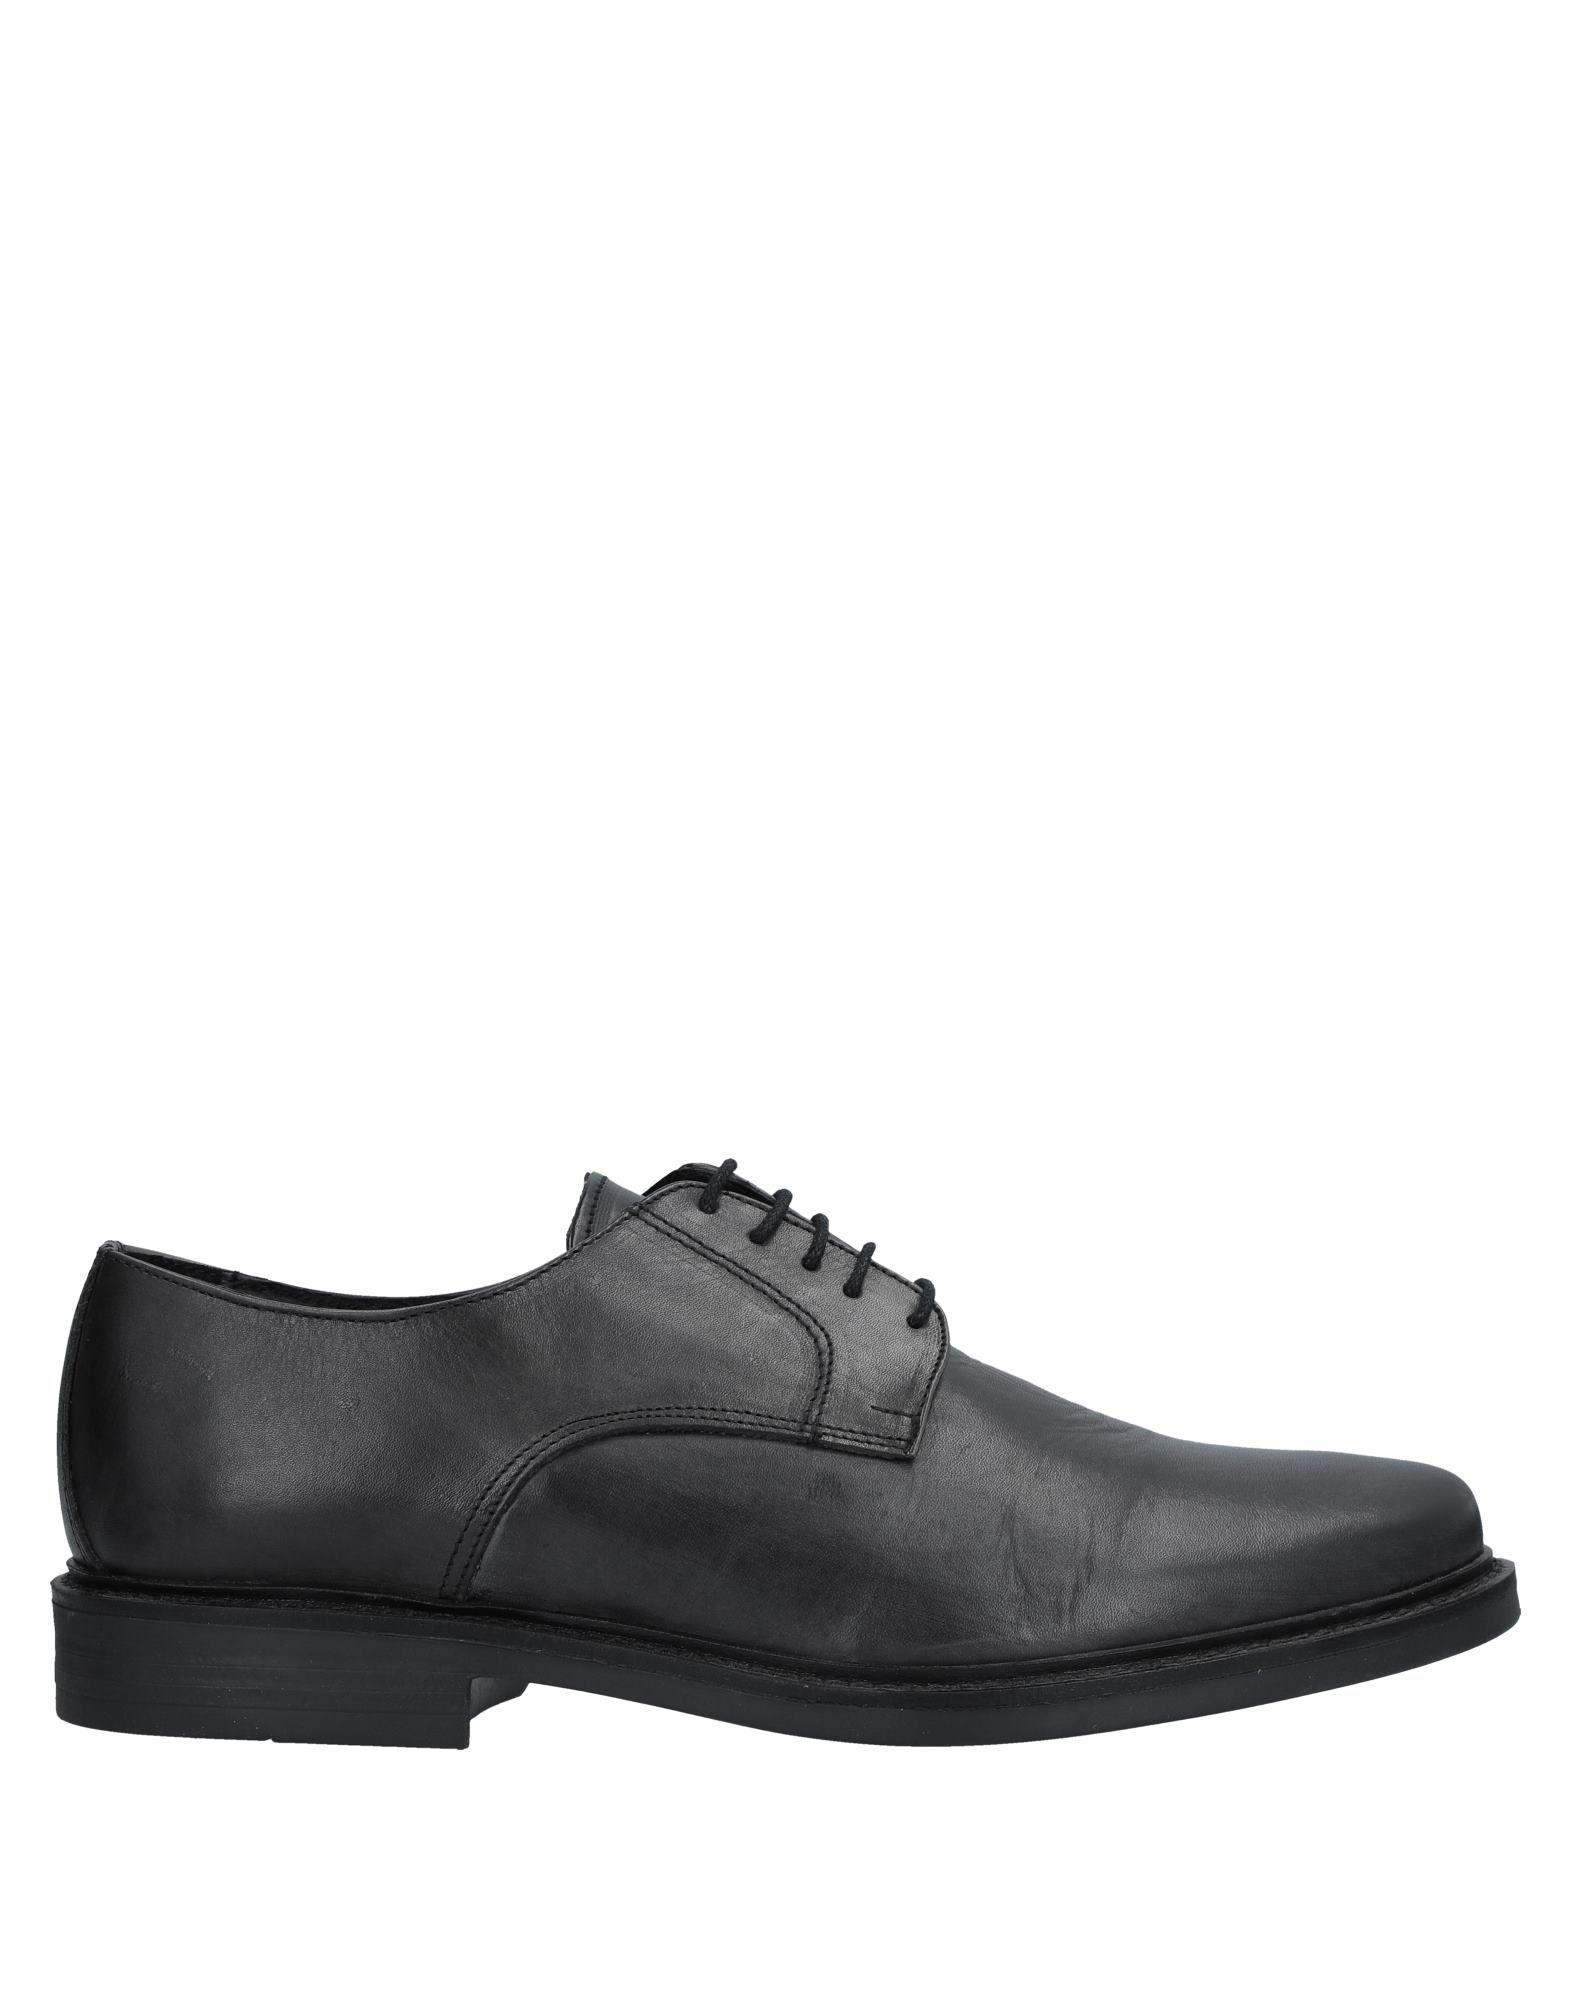 DE MICHELE Обувь на шнурках michele michele 4714t 13 c